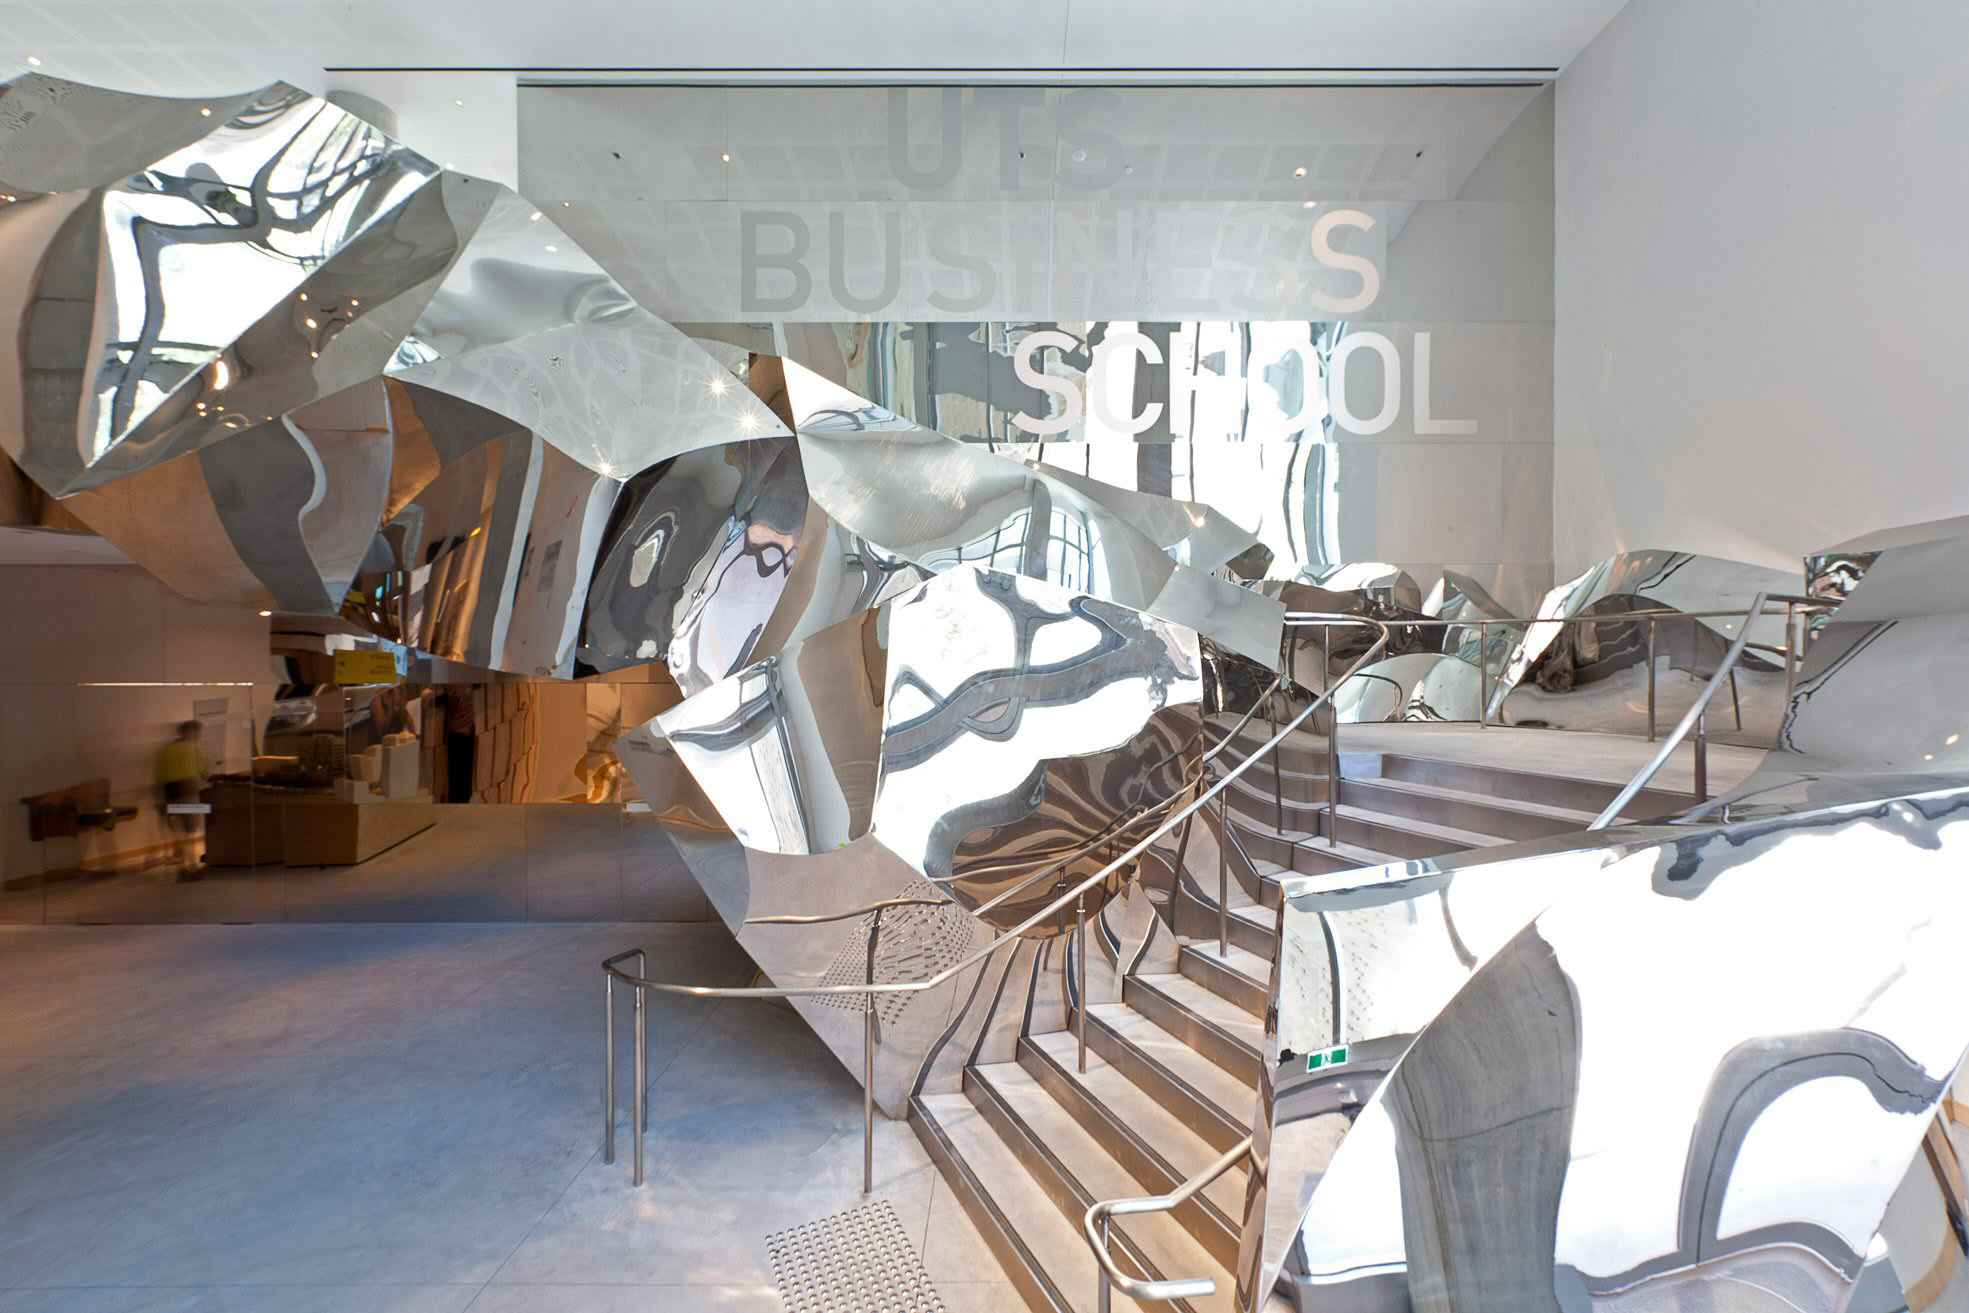 Inside steps of Frank Gehry designed Business School in Sydney, Australia